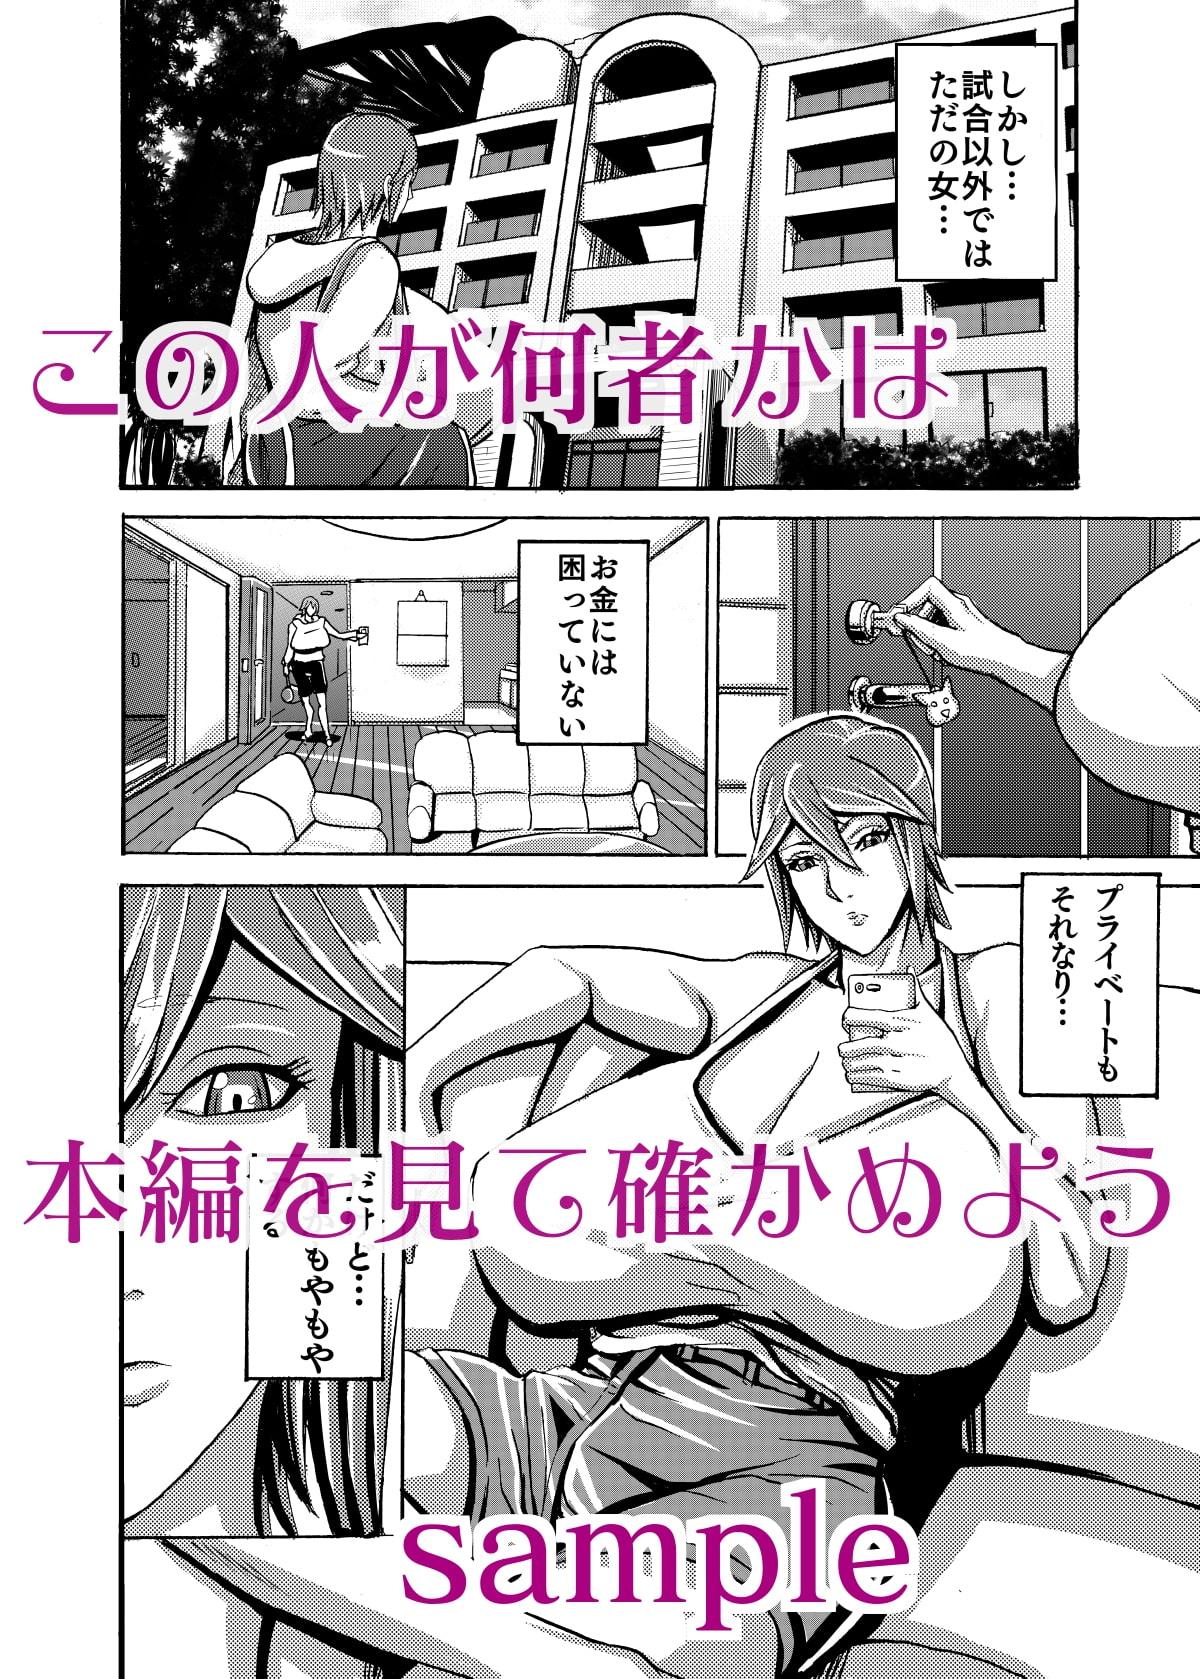 DLsite専売ヴィーナスマンション Episode2